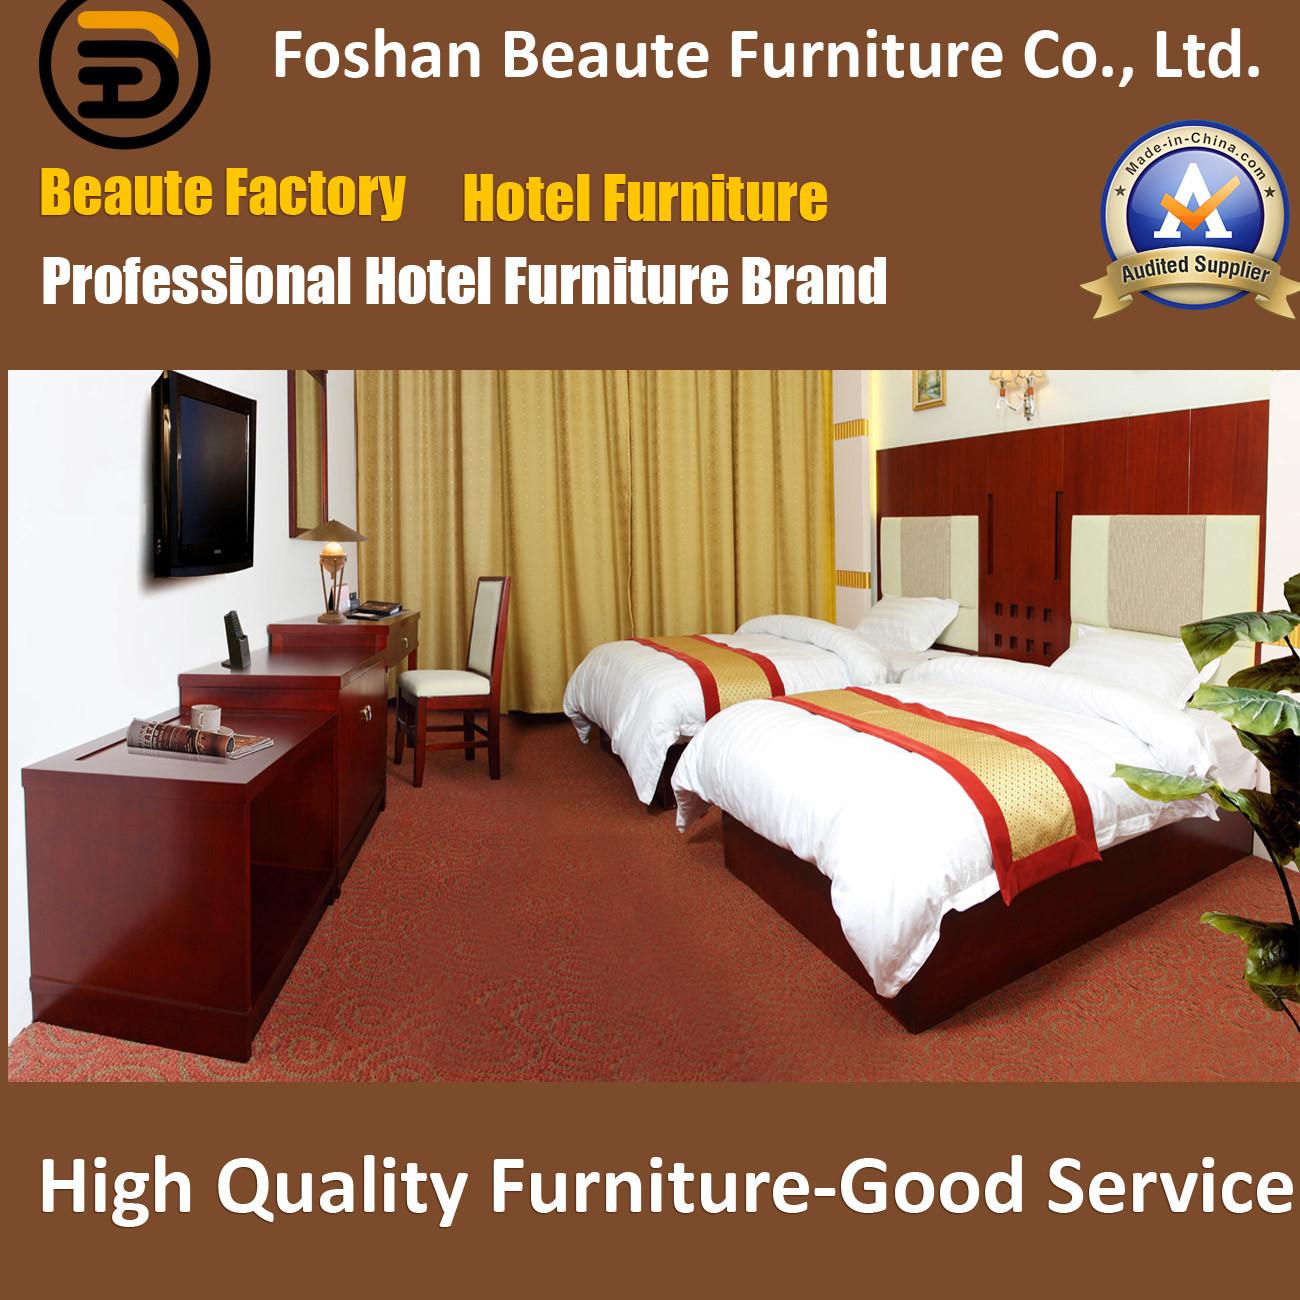 Hotel Furniture/Luxury Double Bedroom Furniture/Standard Hotel Double Bedroom Suite/Double Hospitality Guest Room Furniture (Glb-0109850